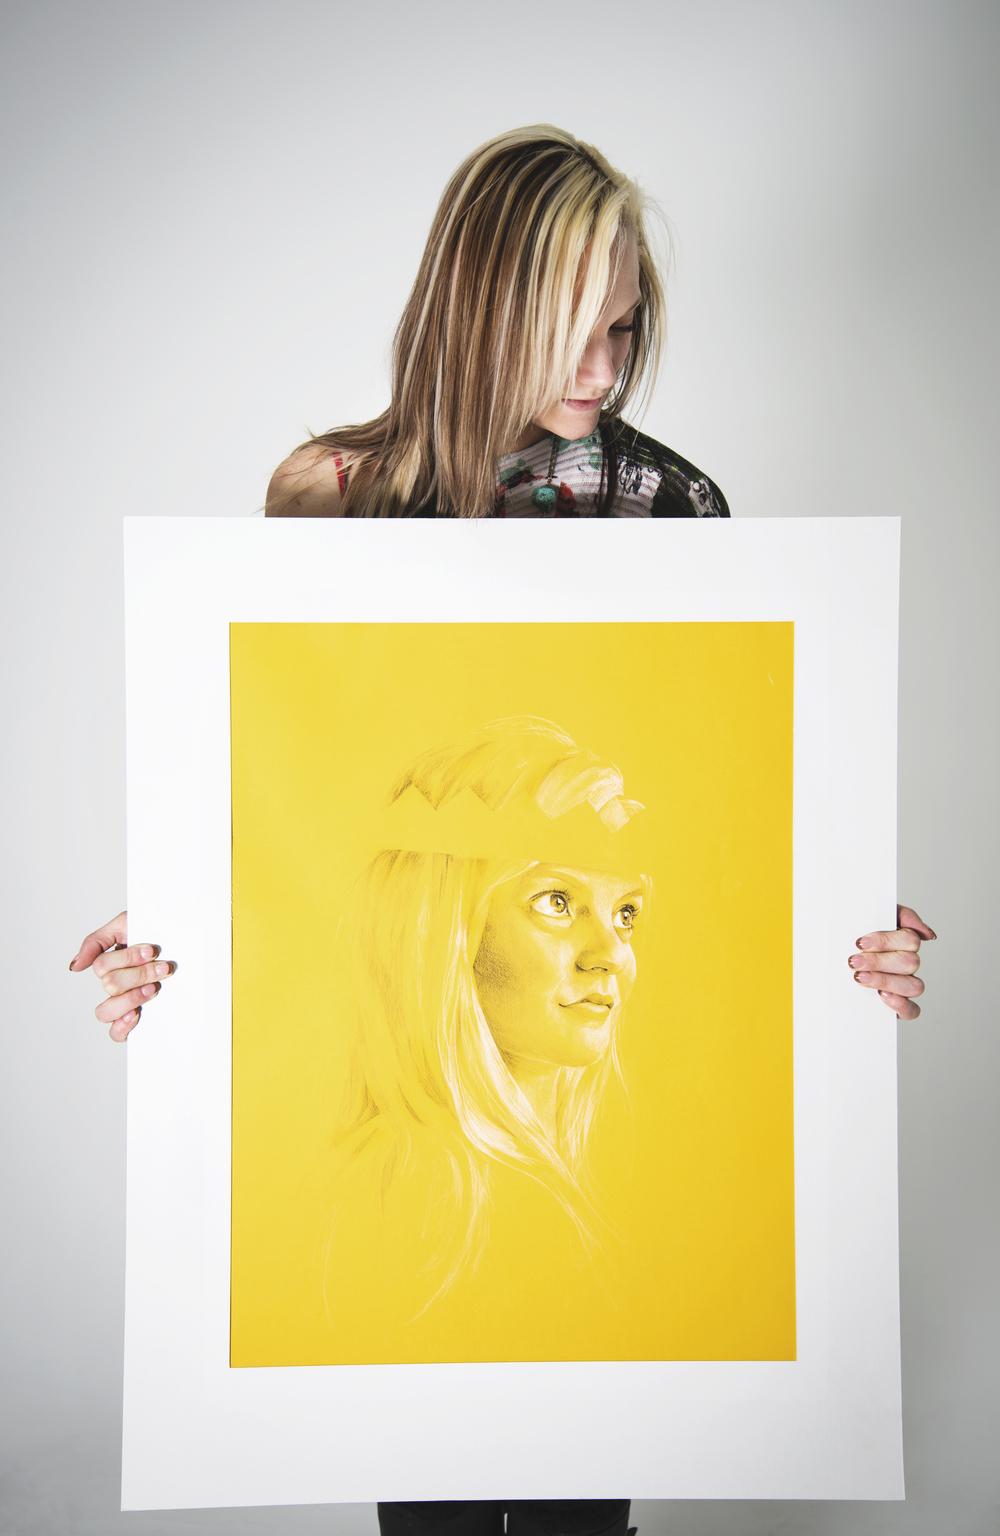 Charcoal portrait by Chavilah Bennett.     Photograph by Sara Santillan